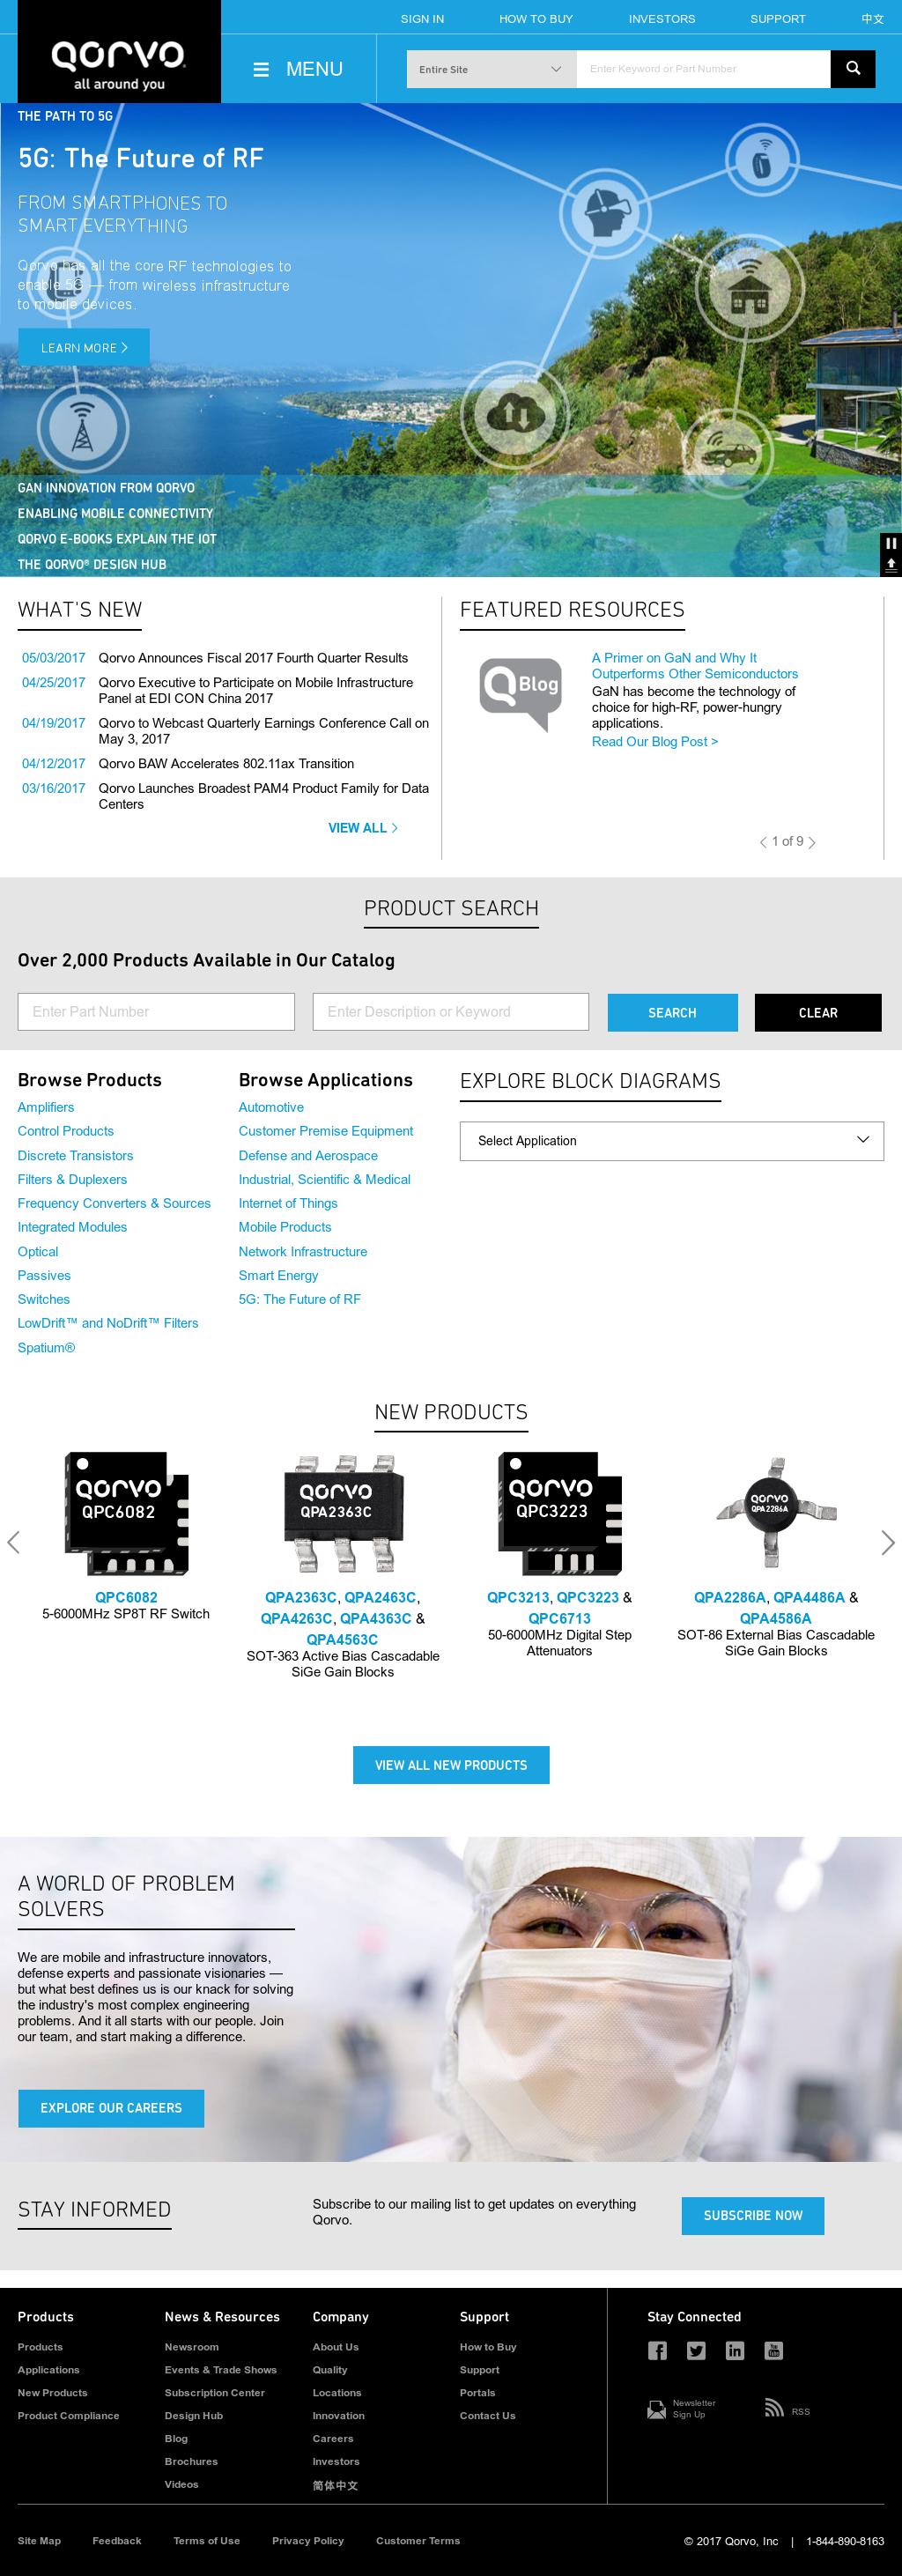 Qorvo Competitors, Revenue and Employees - Owler Company Profile